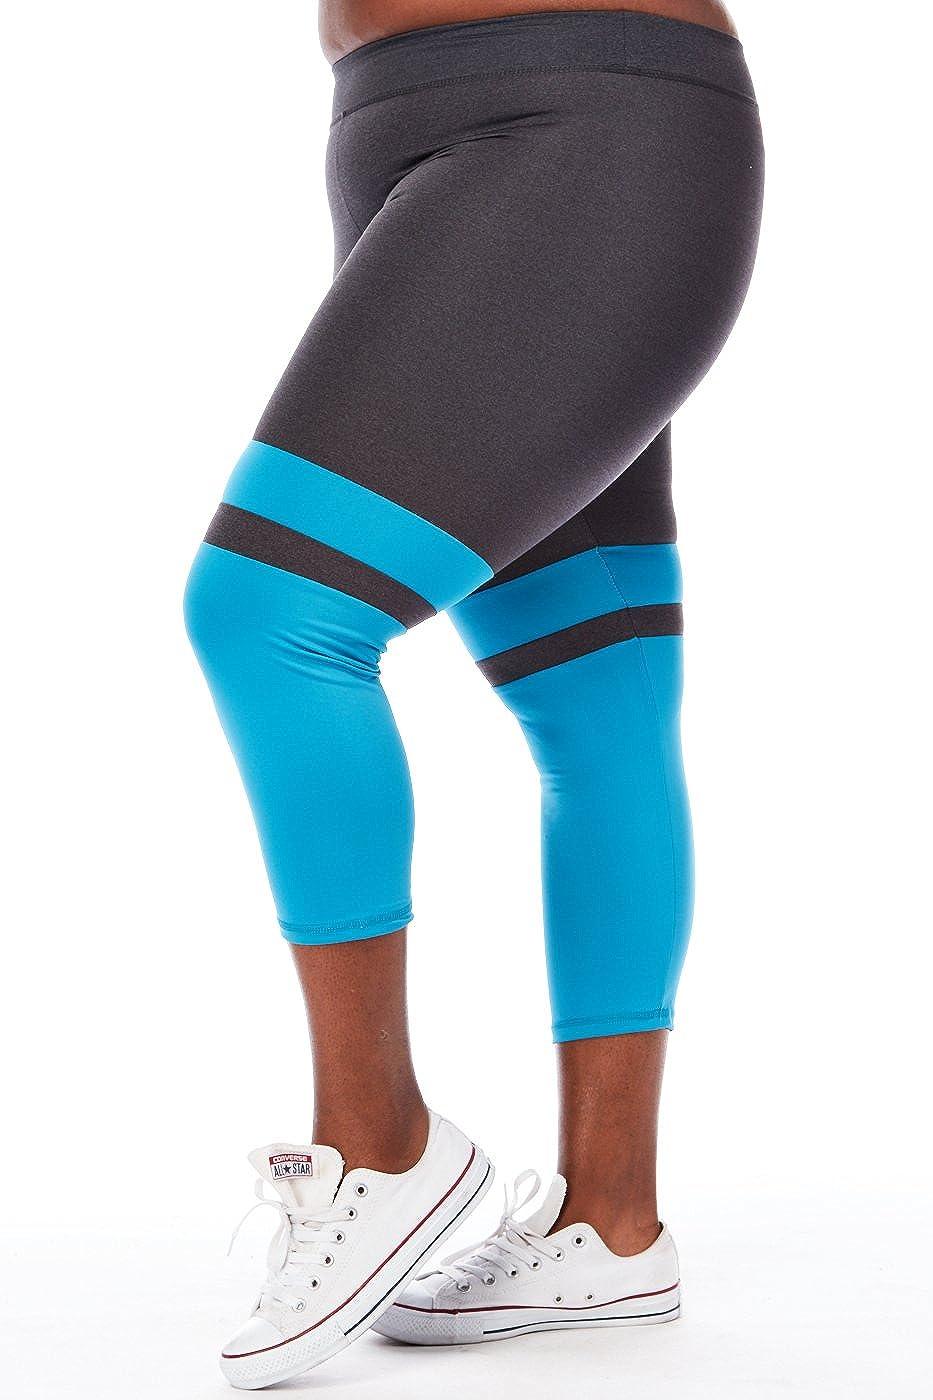 424a1f871c465 GENx Womens Plus Size Color Block Capri Yoga Leggings 21503X at Amazon  Women's Clothing store: